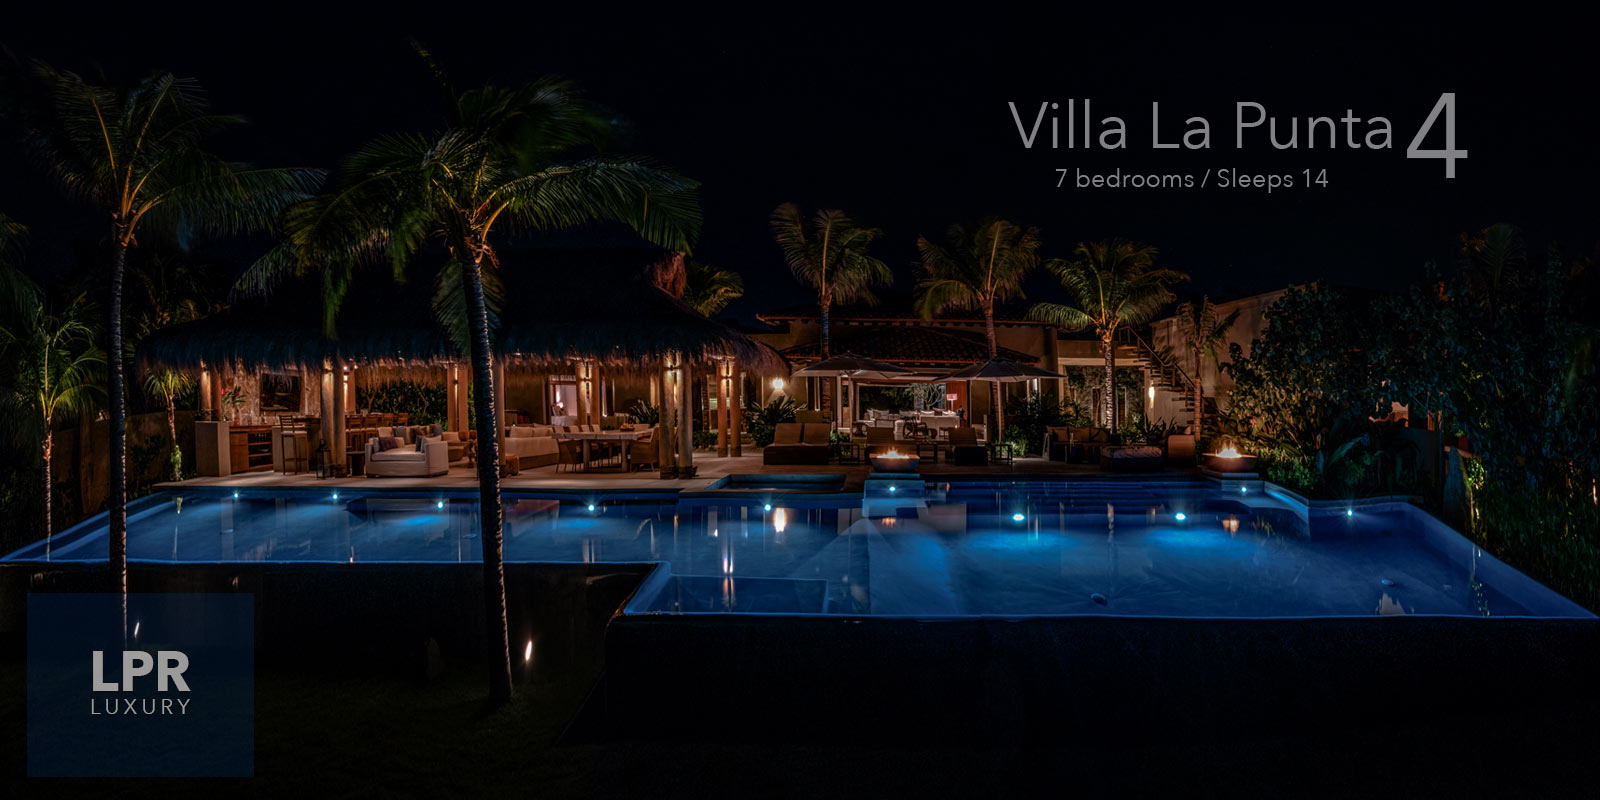 Villa La Punta 4 - Ultra luxury, ultra private vacation rental villa estate at the exclusive Punta Mita Resort, Riviera Nayarit, Mexico